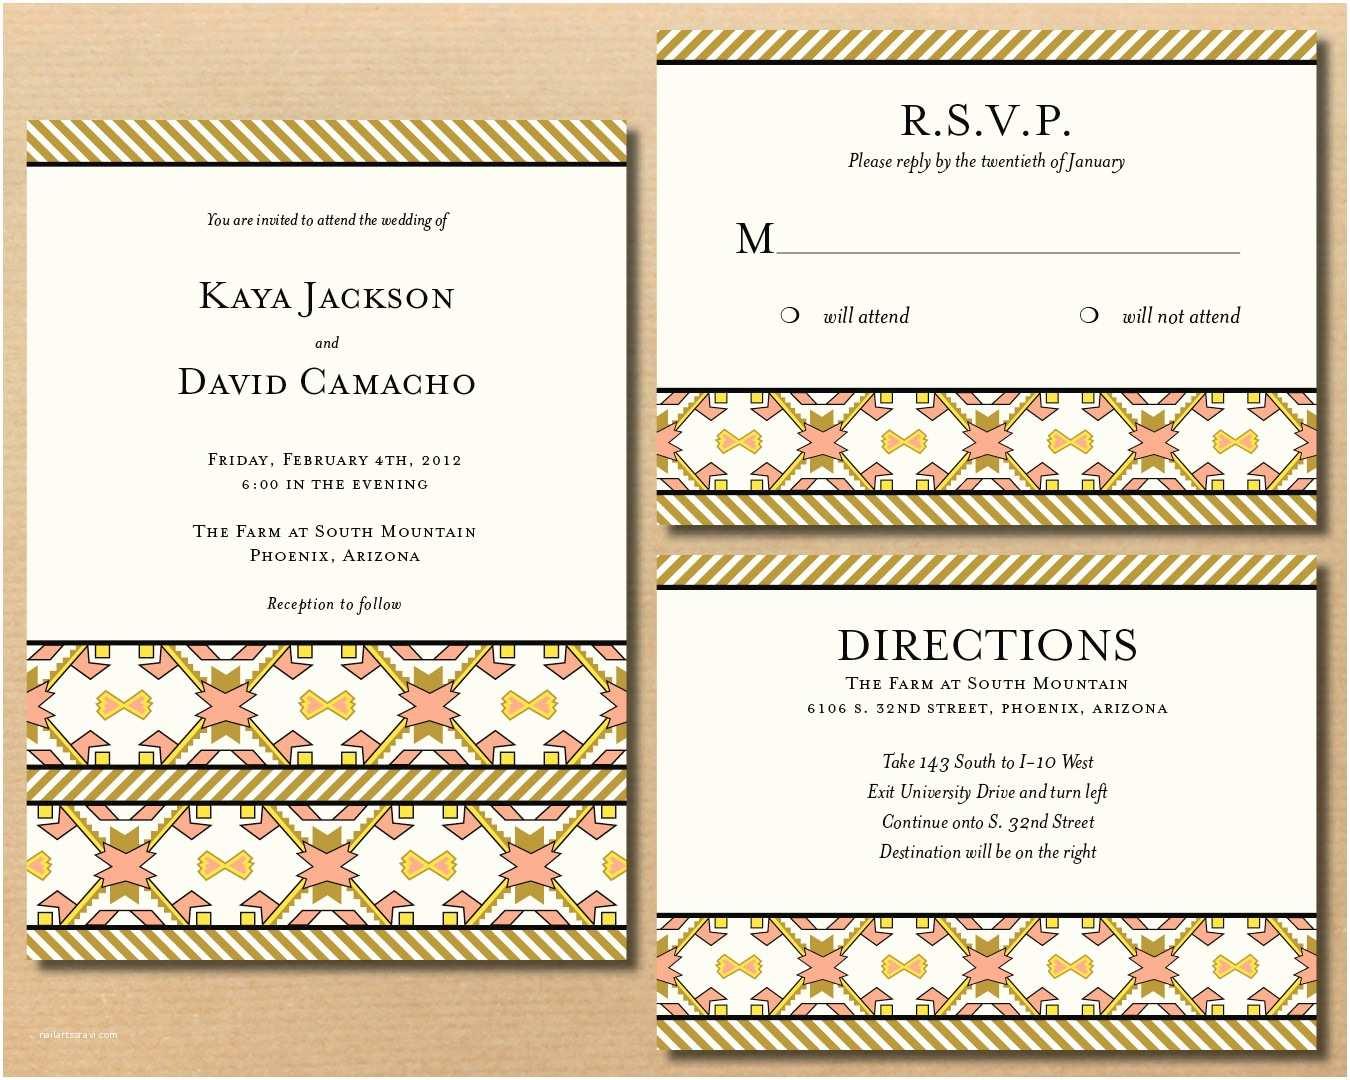 American Stationery Wedding Invitations River & Bridge Native American Influenced Wedding Invitations